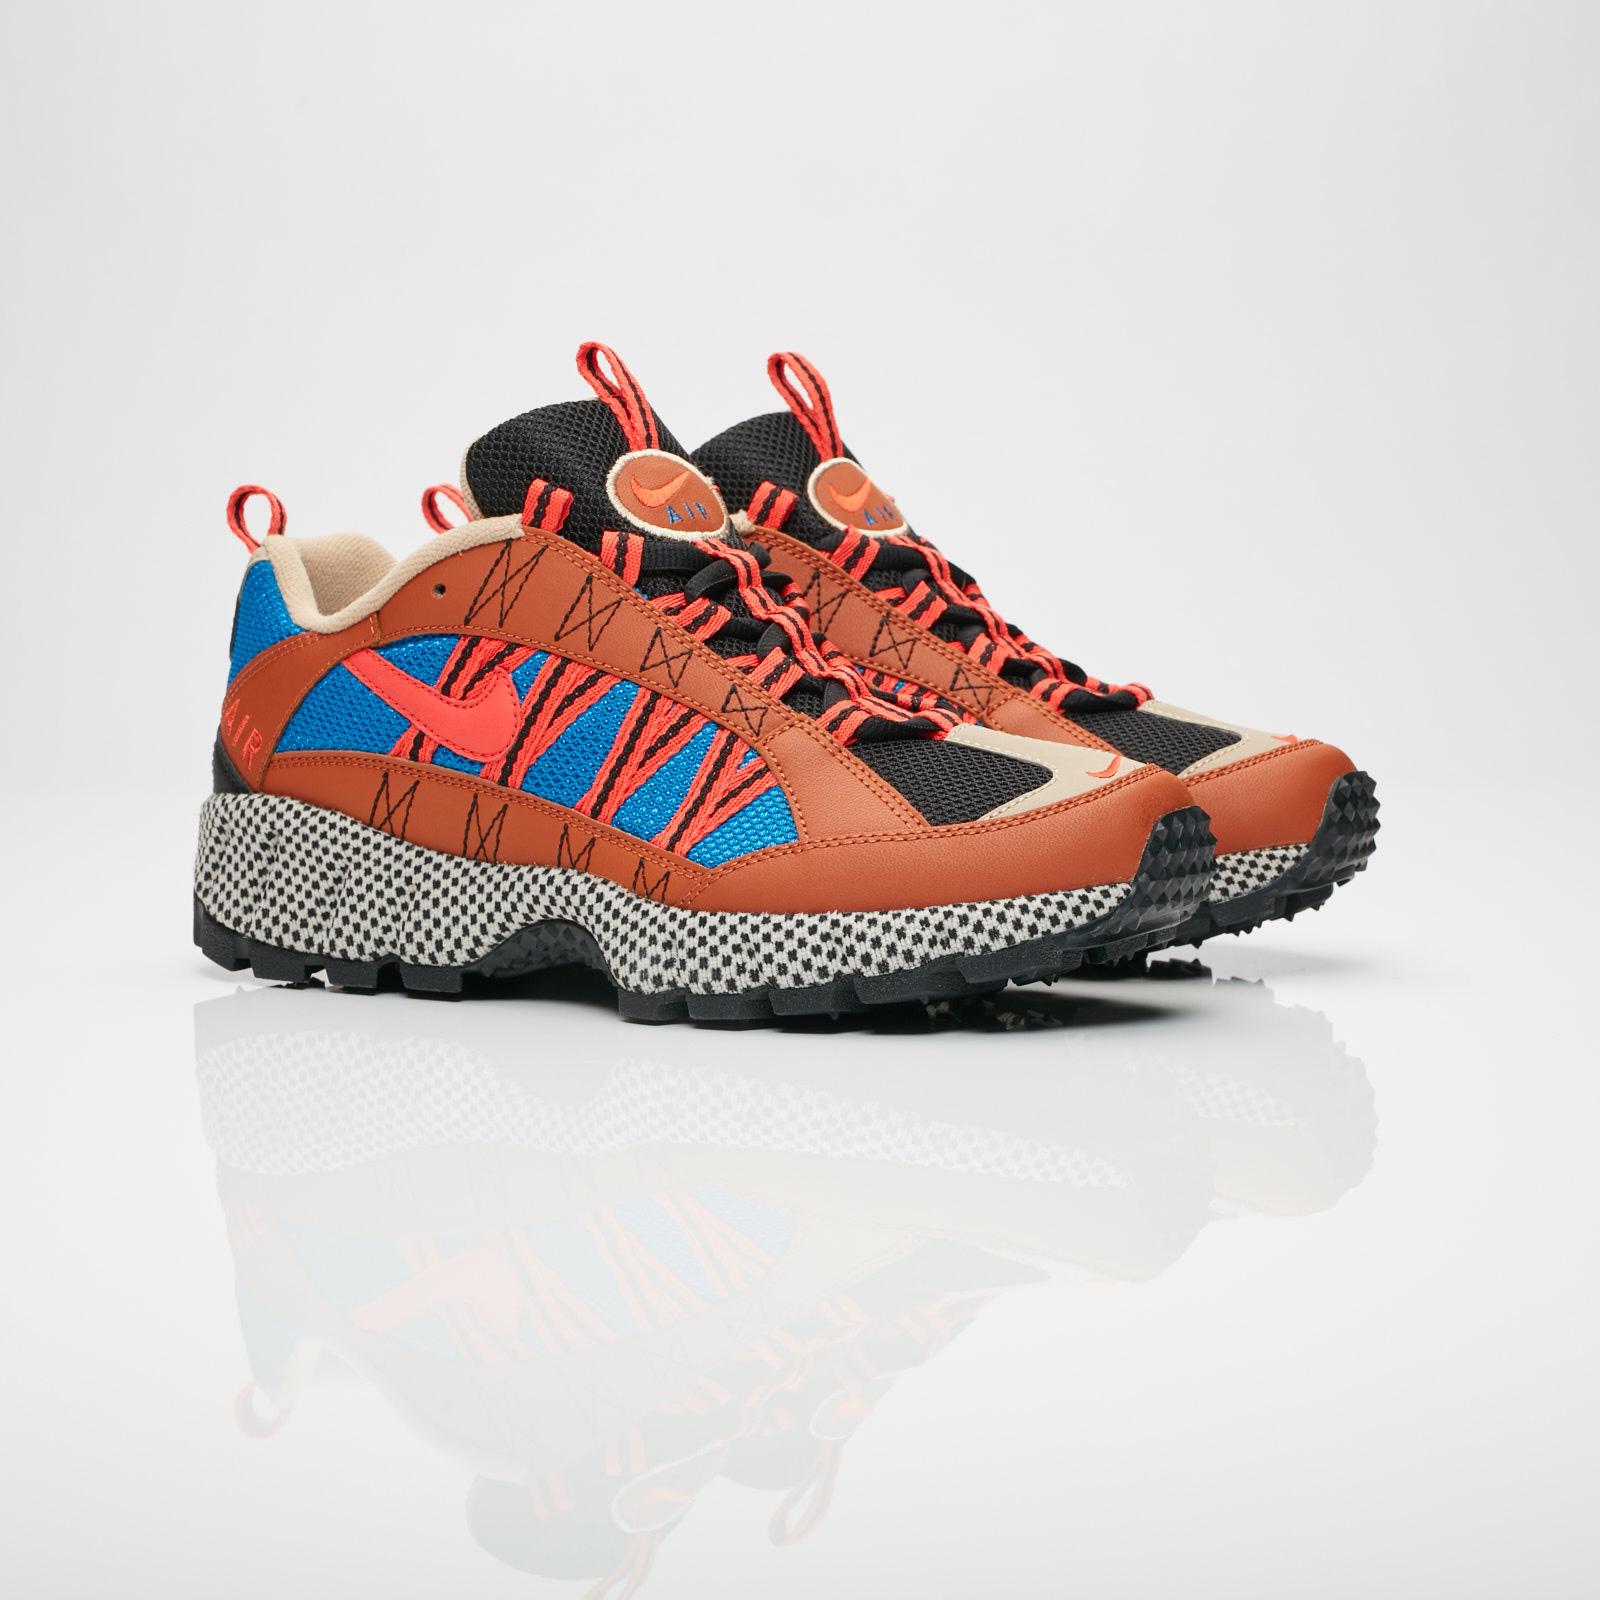 low priced 4fcdc 31969 Nike Sportswear Air Humara 17 QS